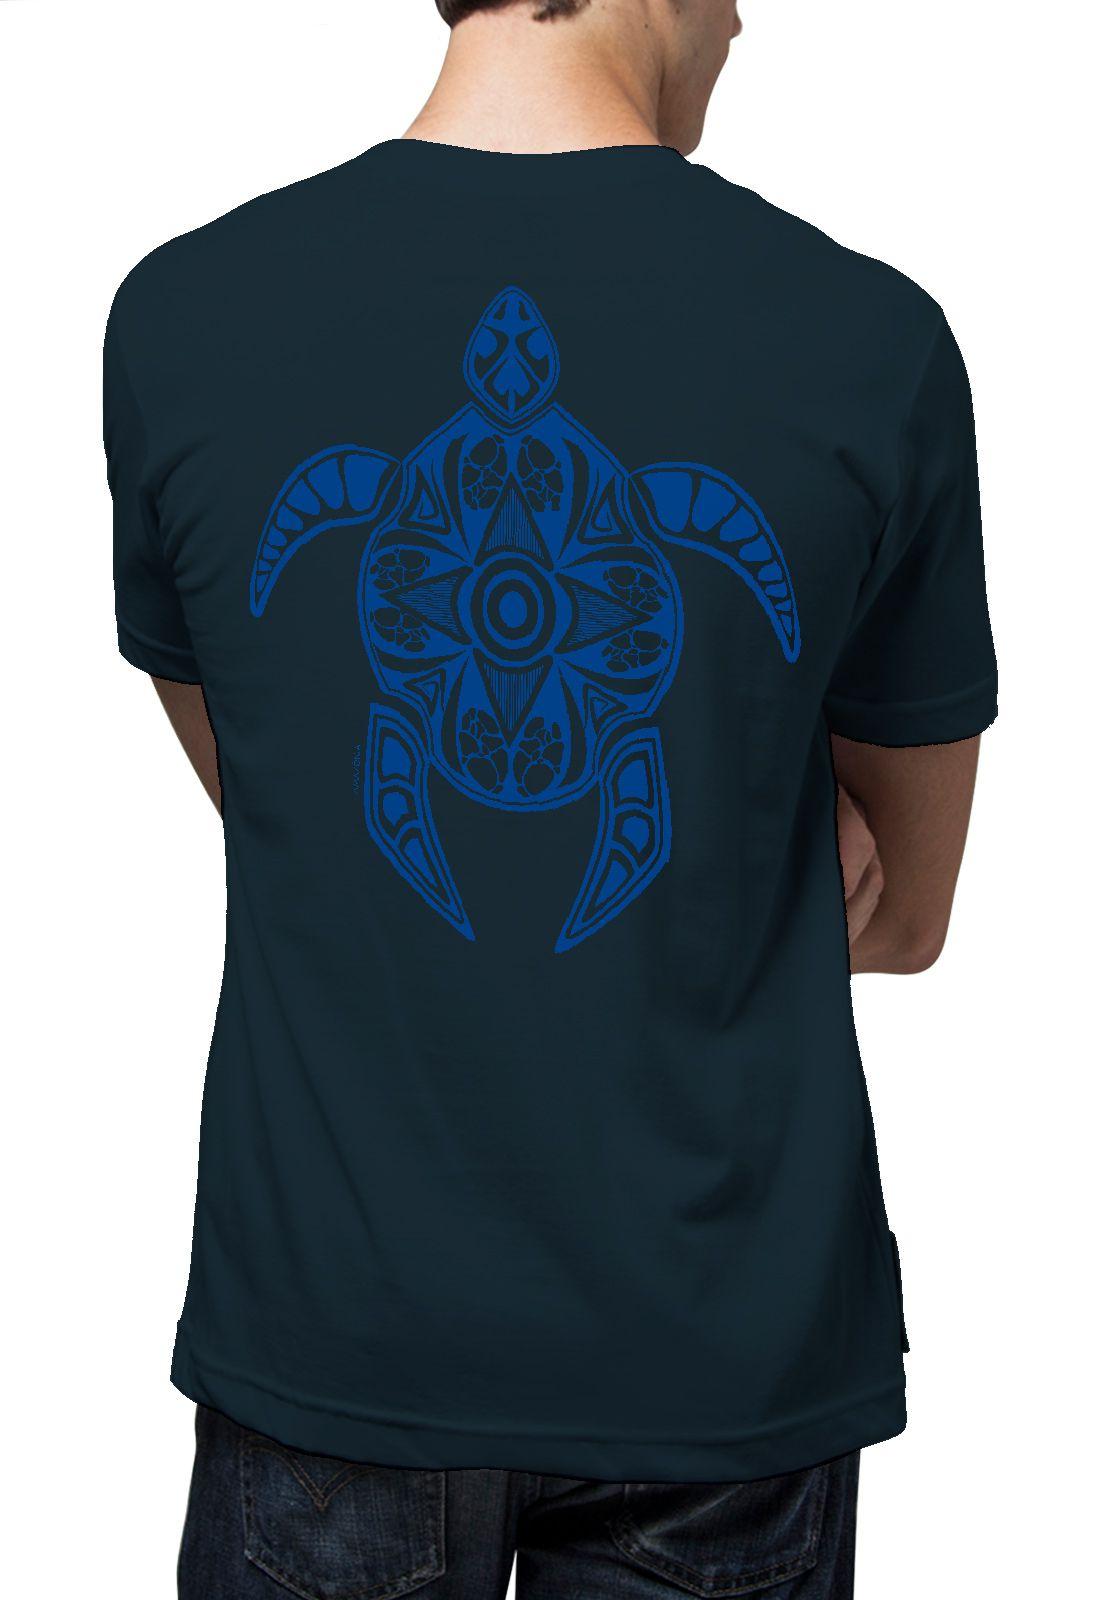 Camiseta Amazônia Tartaruga Maori - Azul Escuro